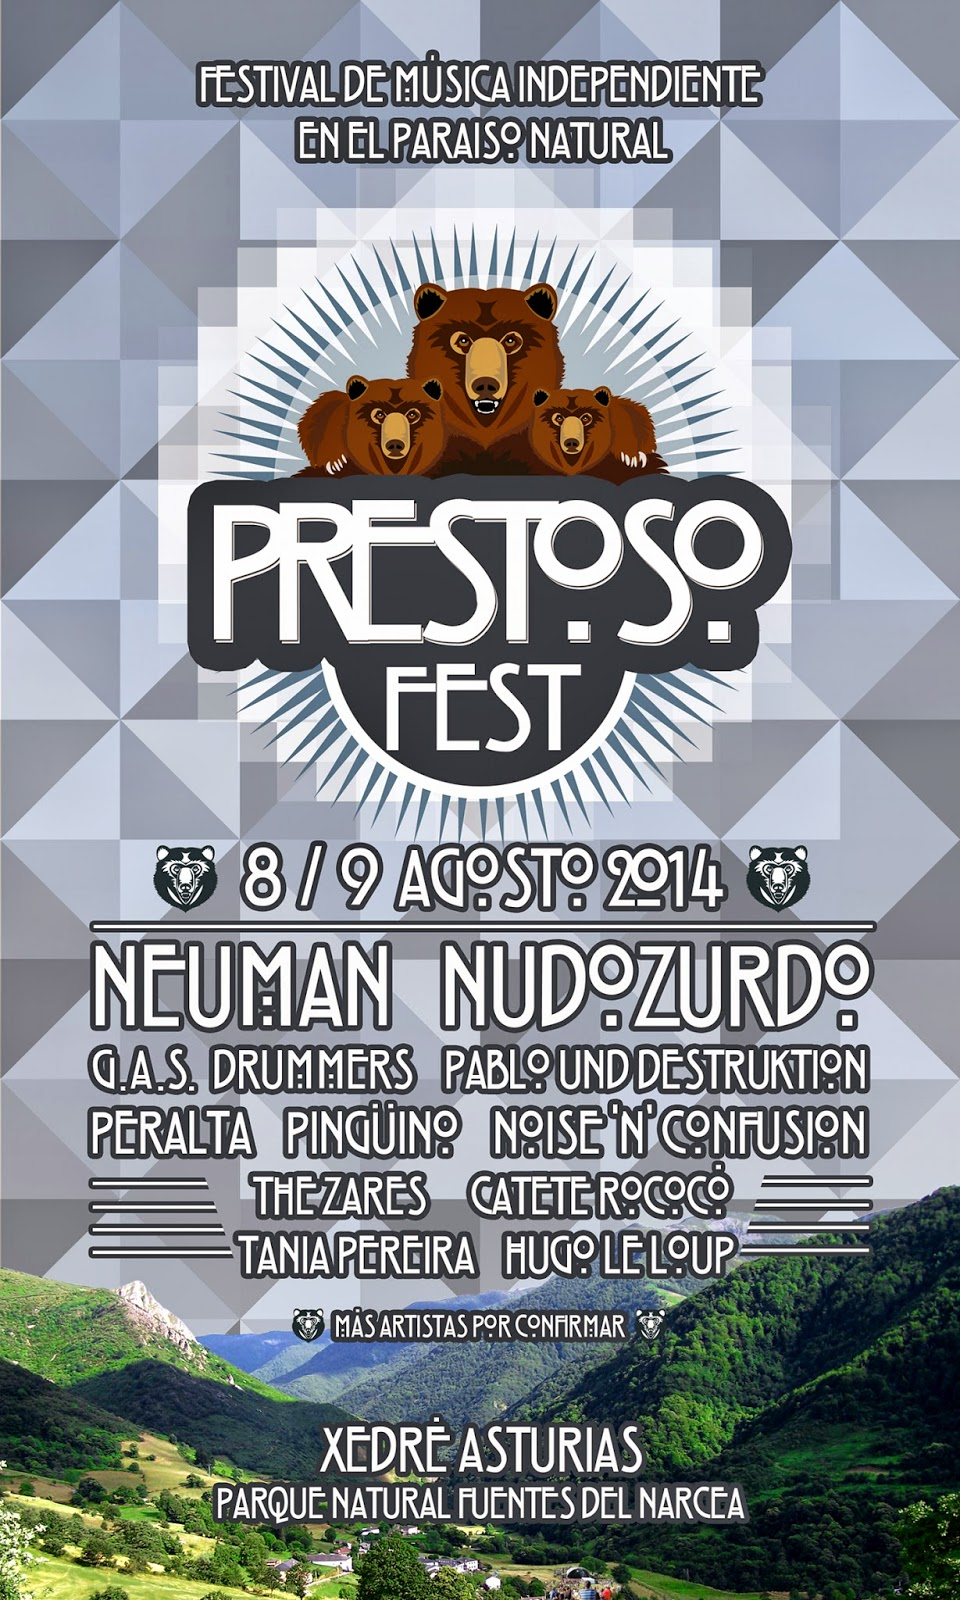 Prestoso Fest 2014 cartel